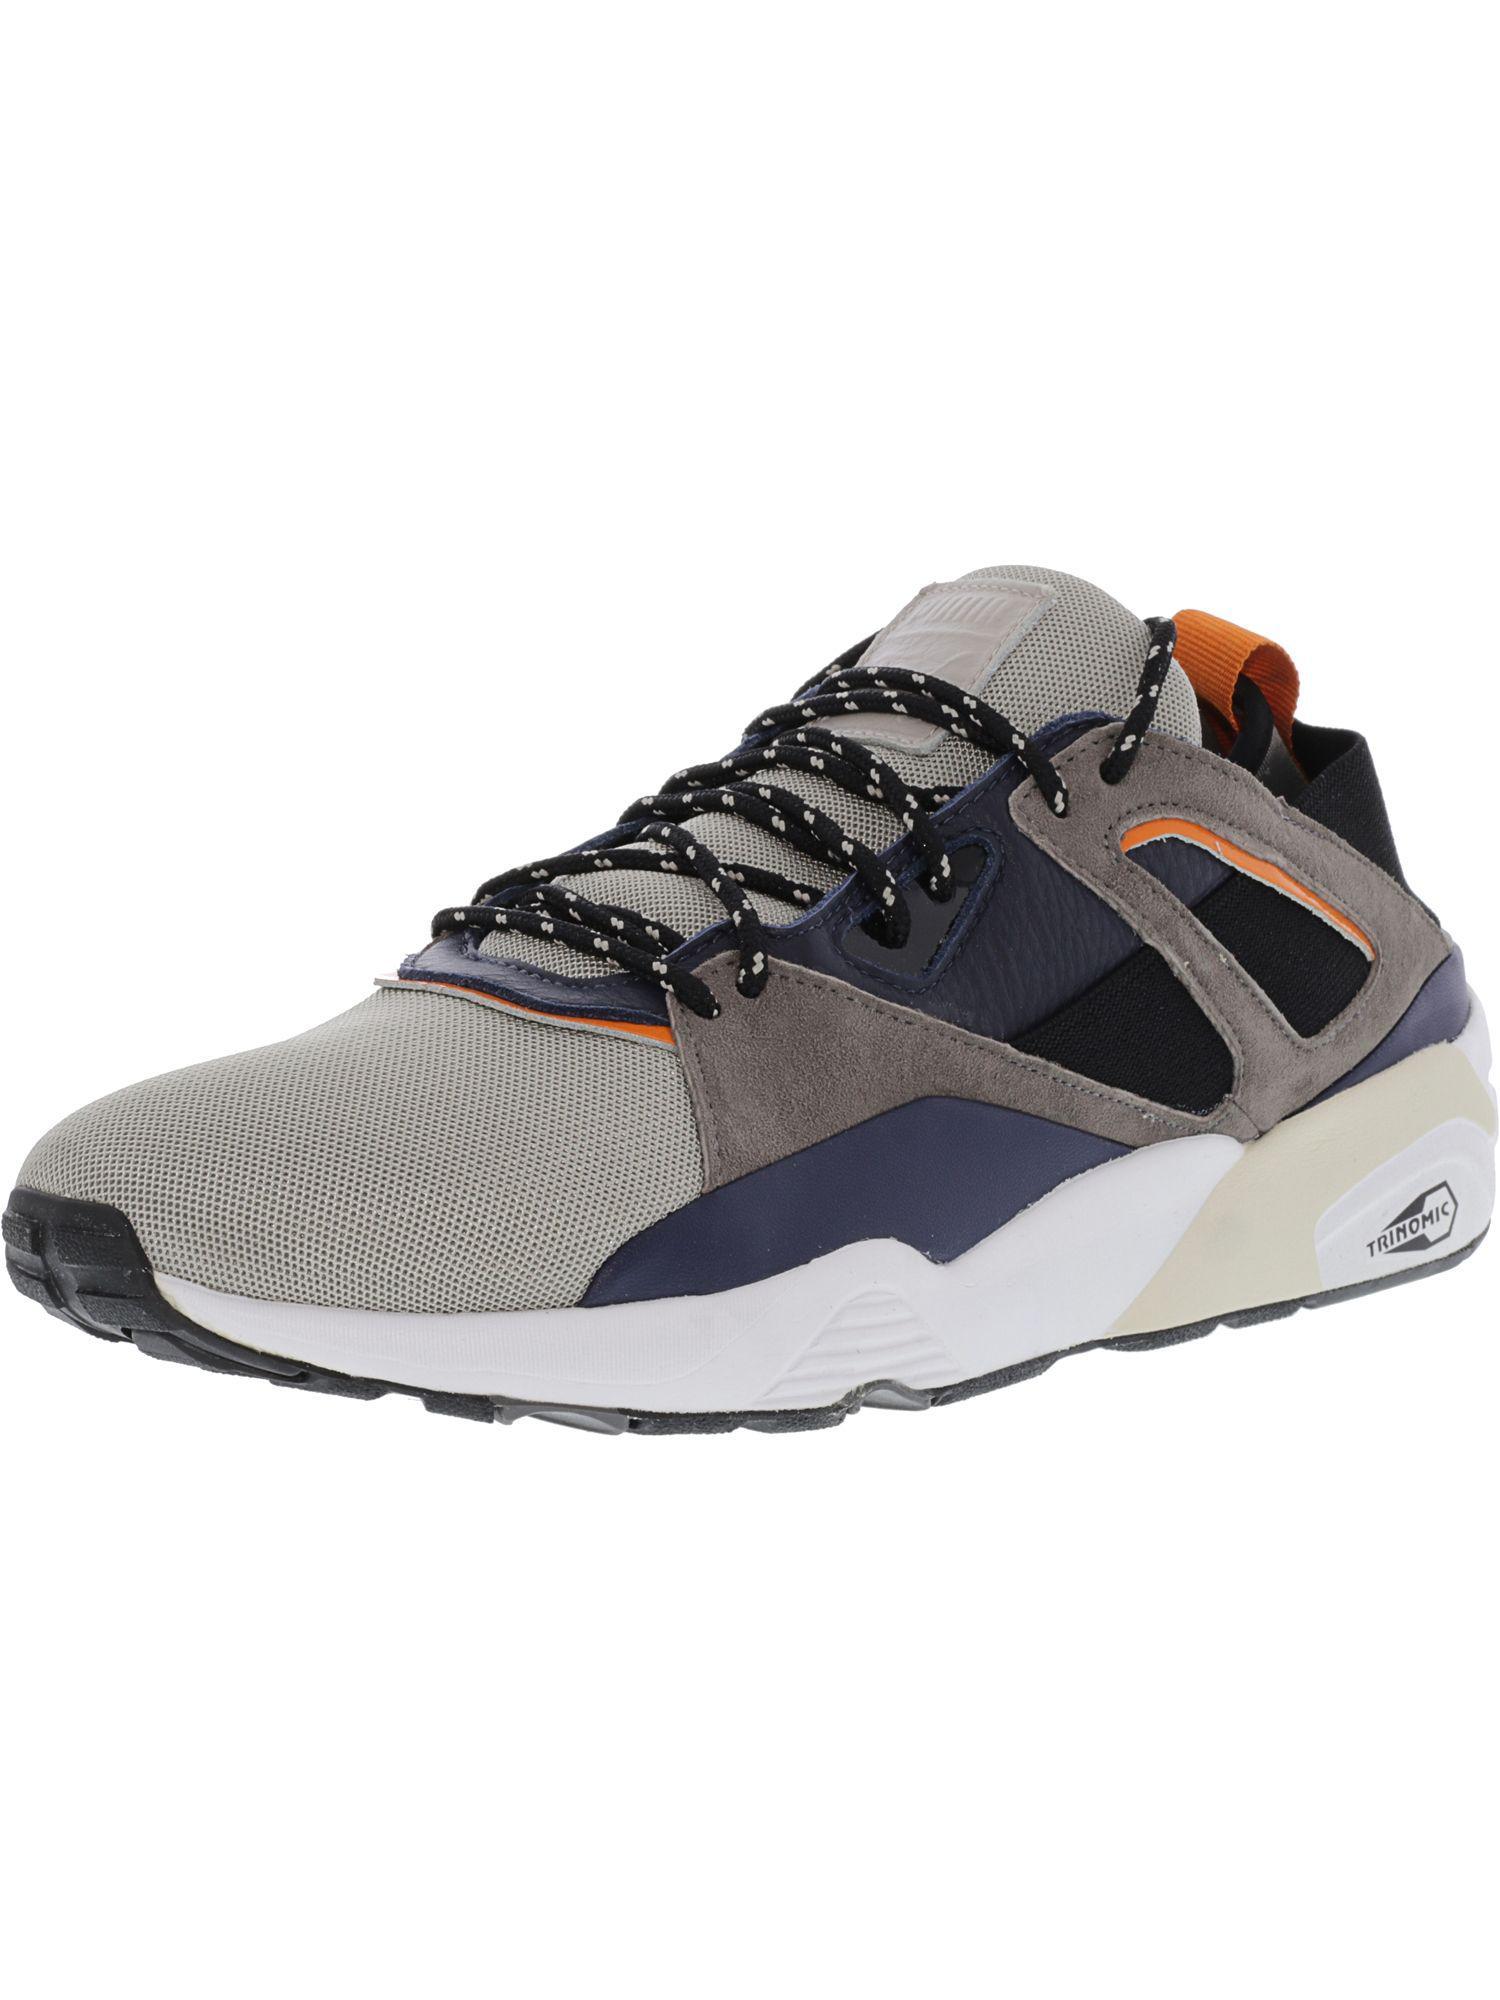 16ce9ad664c64 Lyst - Puma Men's Blaze Of Glory Sock Elemental Ankle-high Fashion ...